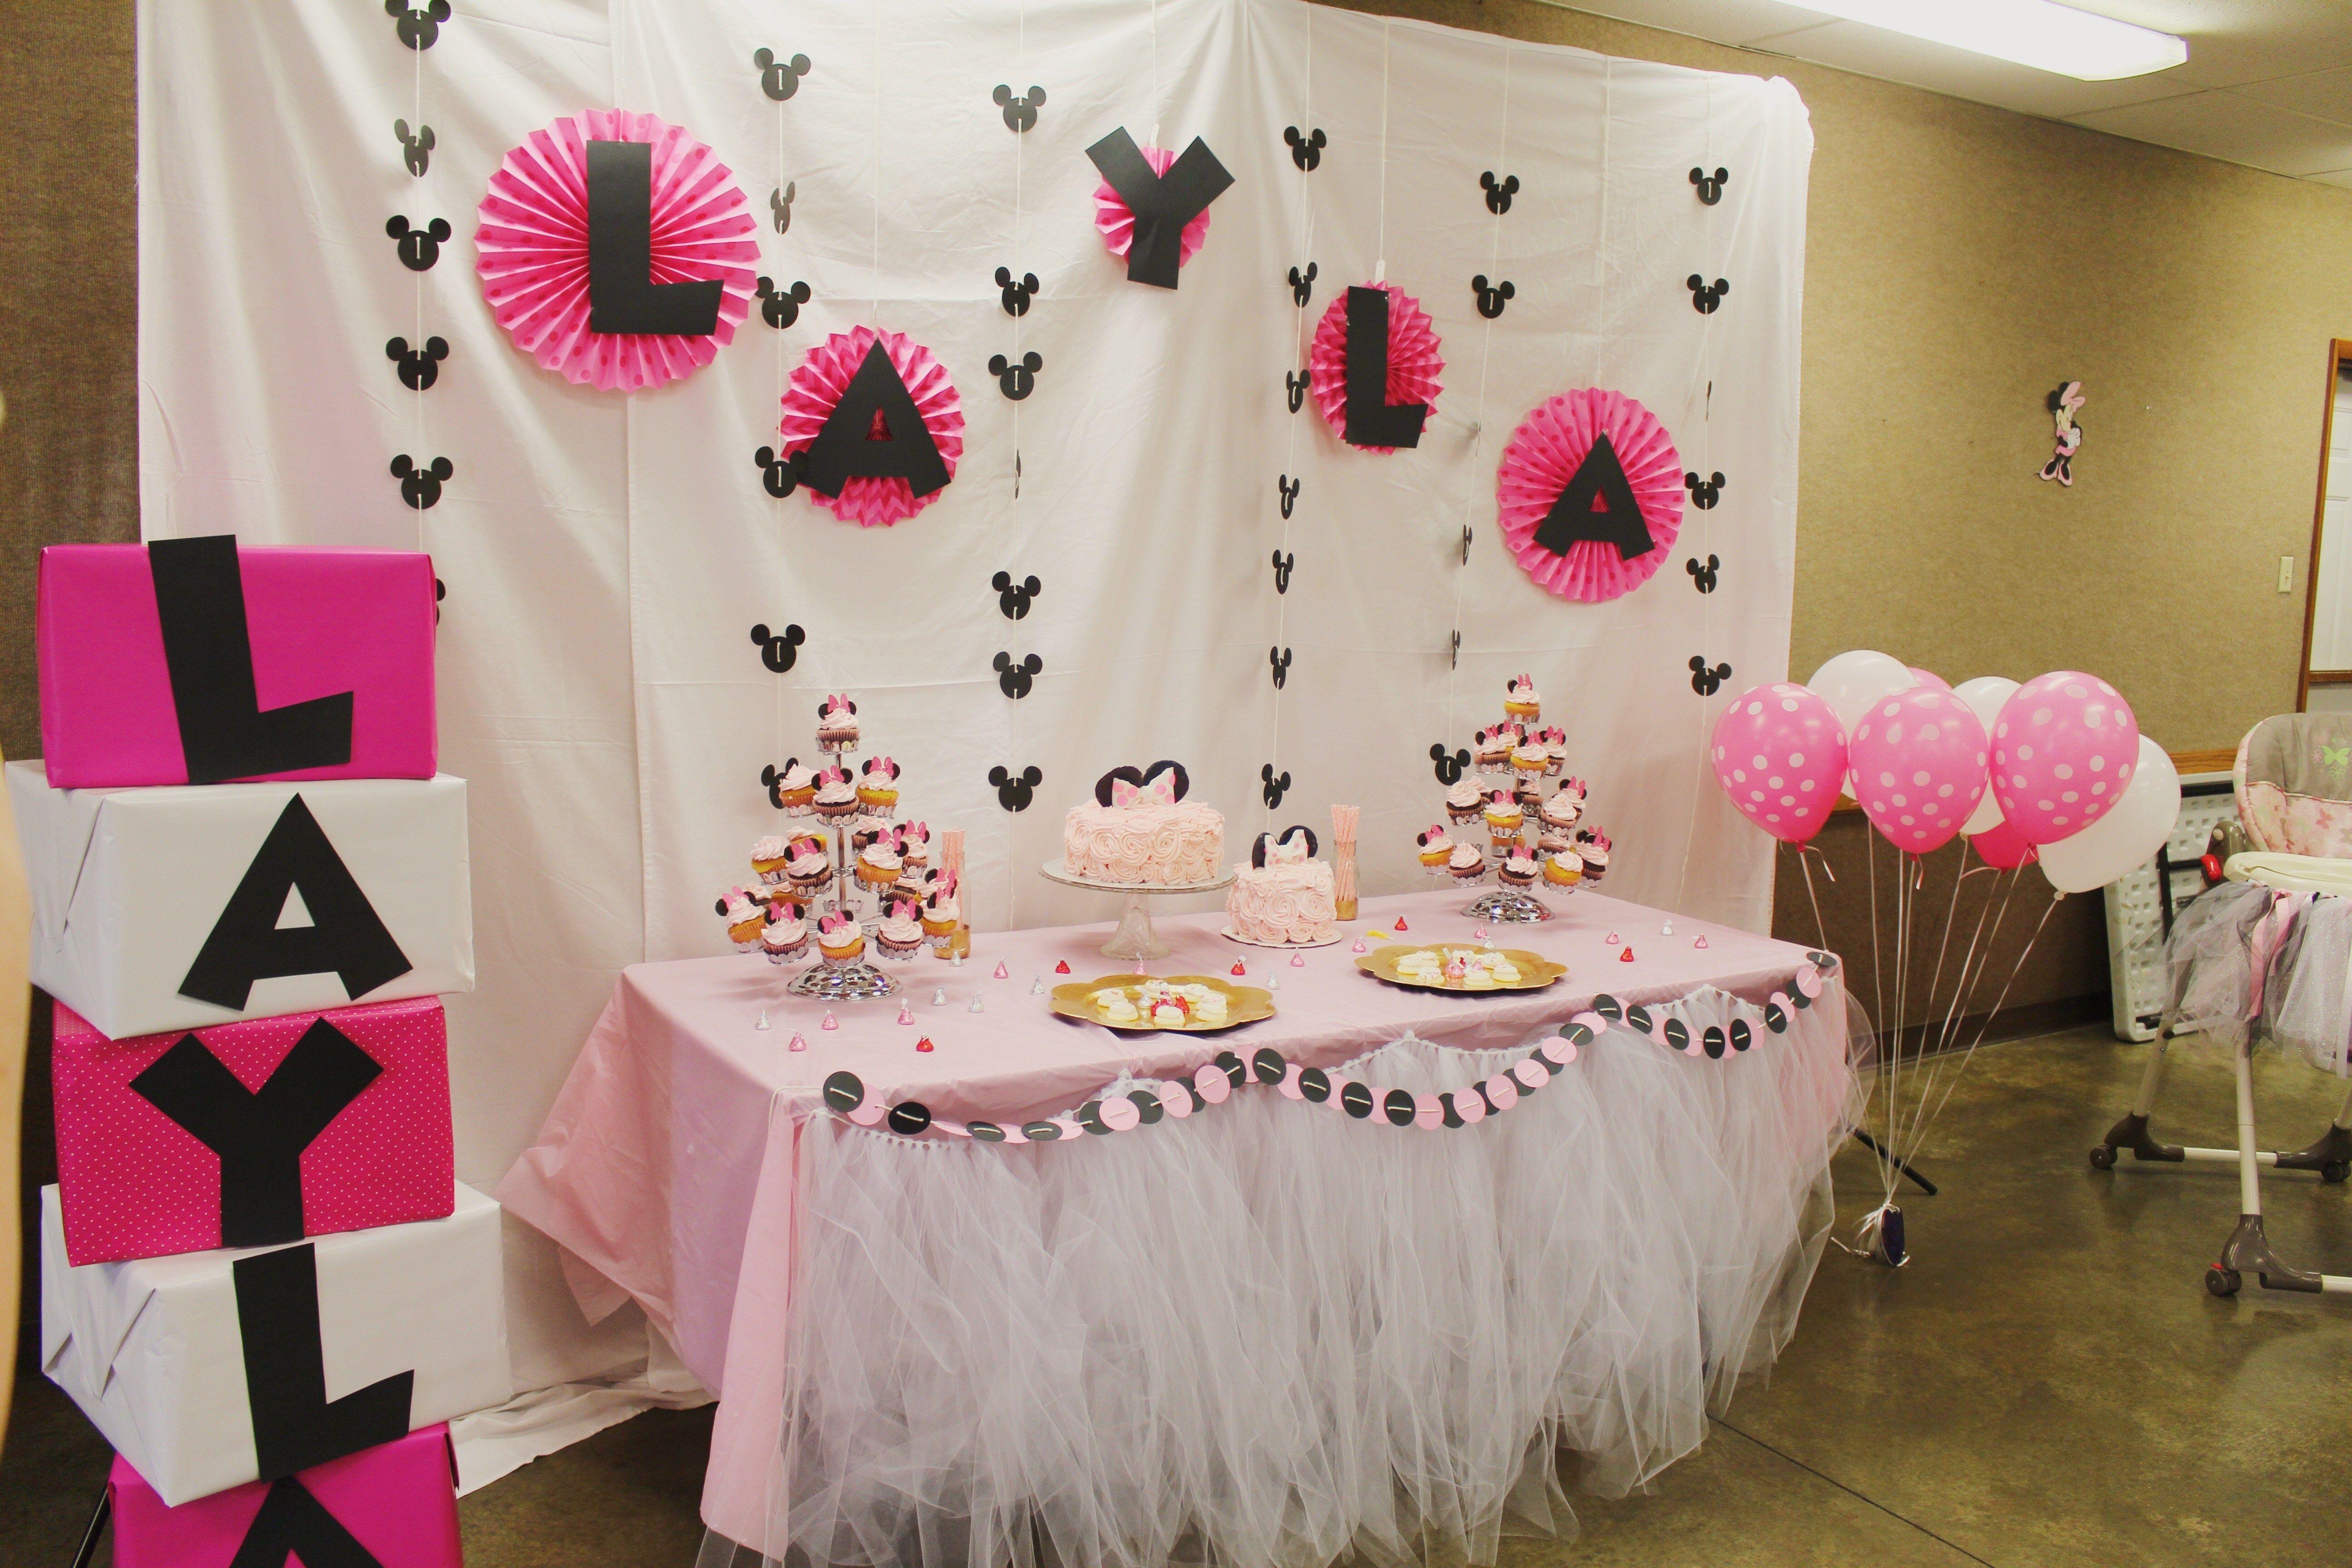 Diy 1st Birthday Minnie Mouse Party Minnie Mouse Party Decorations Minnie Mouse Party Birthday Table